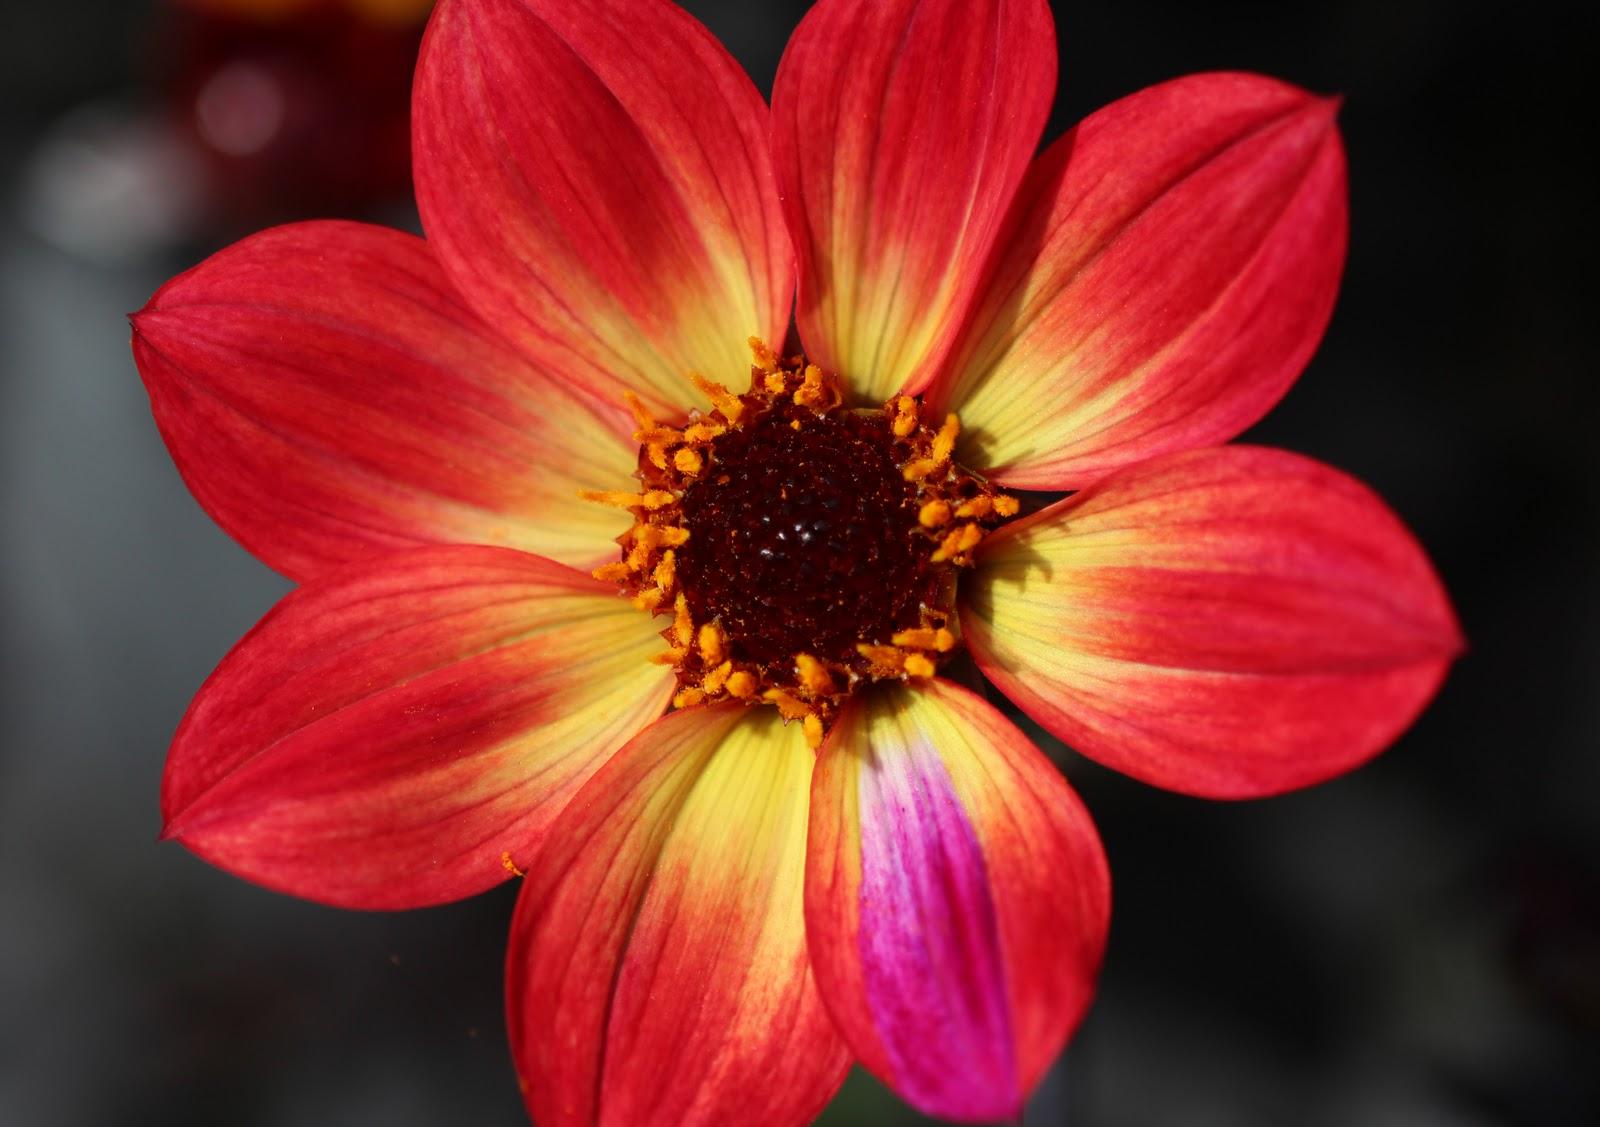 http://3.bp.blogspot.com/-Fts9Yqo4HD0/TqFHUREhpkI/AAAAAAAACPo/IGf6BUDGSfU/s1600/interestingdahlia.jpg